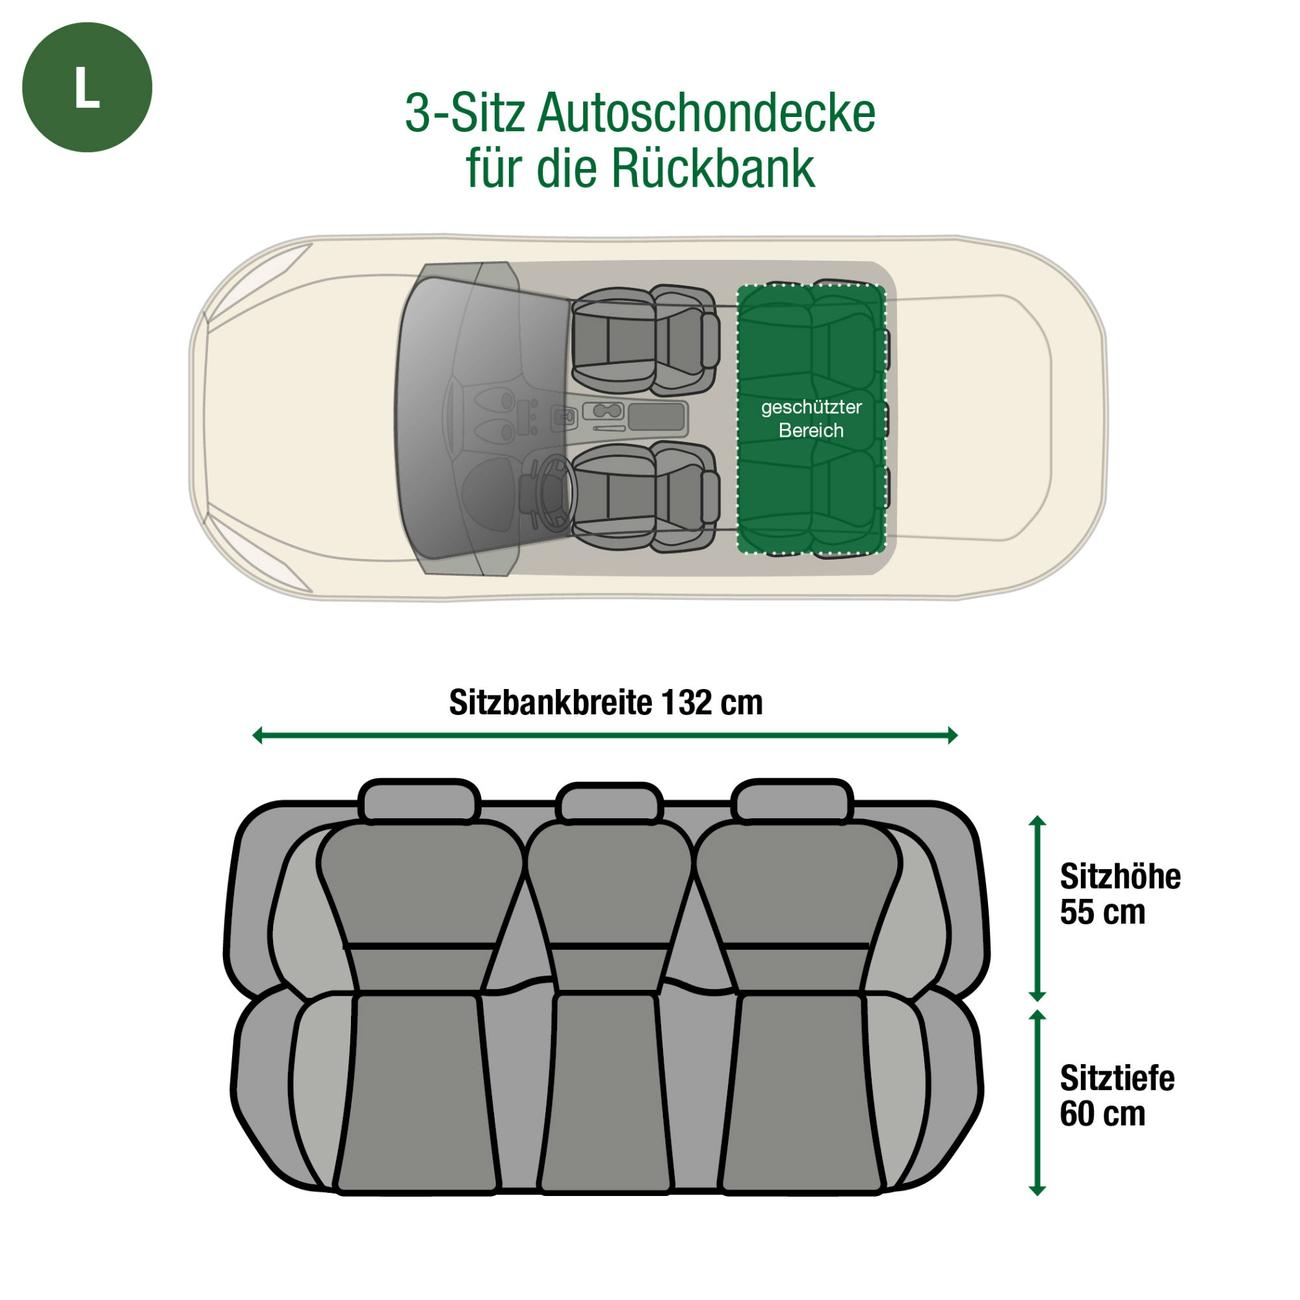 Doctor Bark Autodecke 3-Sitz Rücksitz, Bild 23